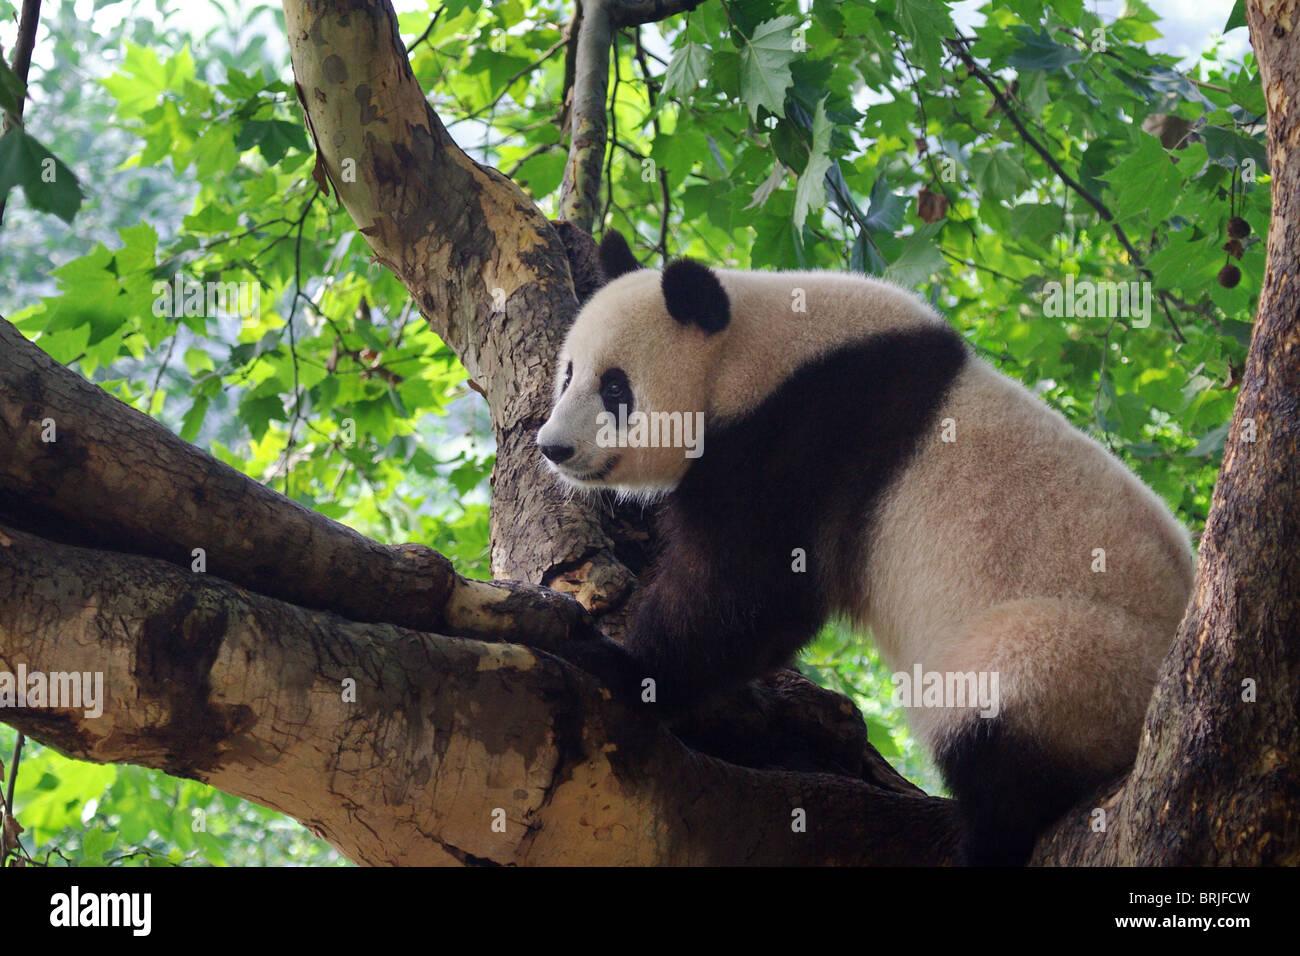 Giant Panda in Chengdu Panda Base, China - Stock Image